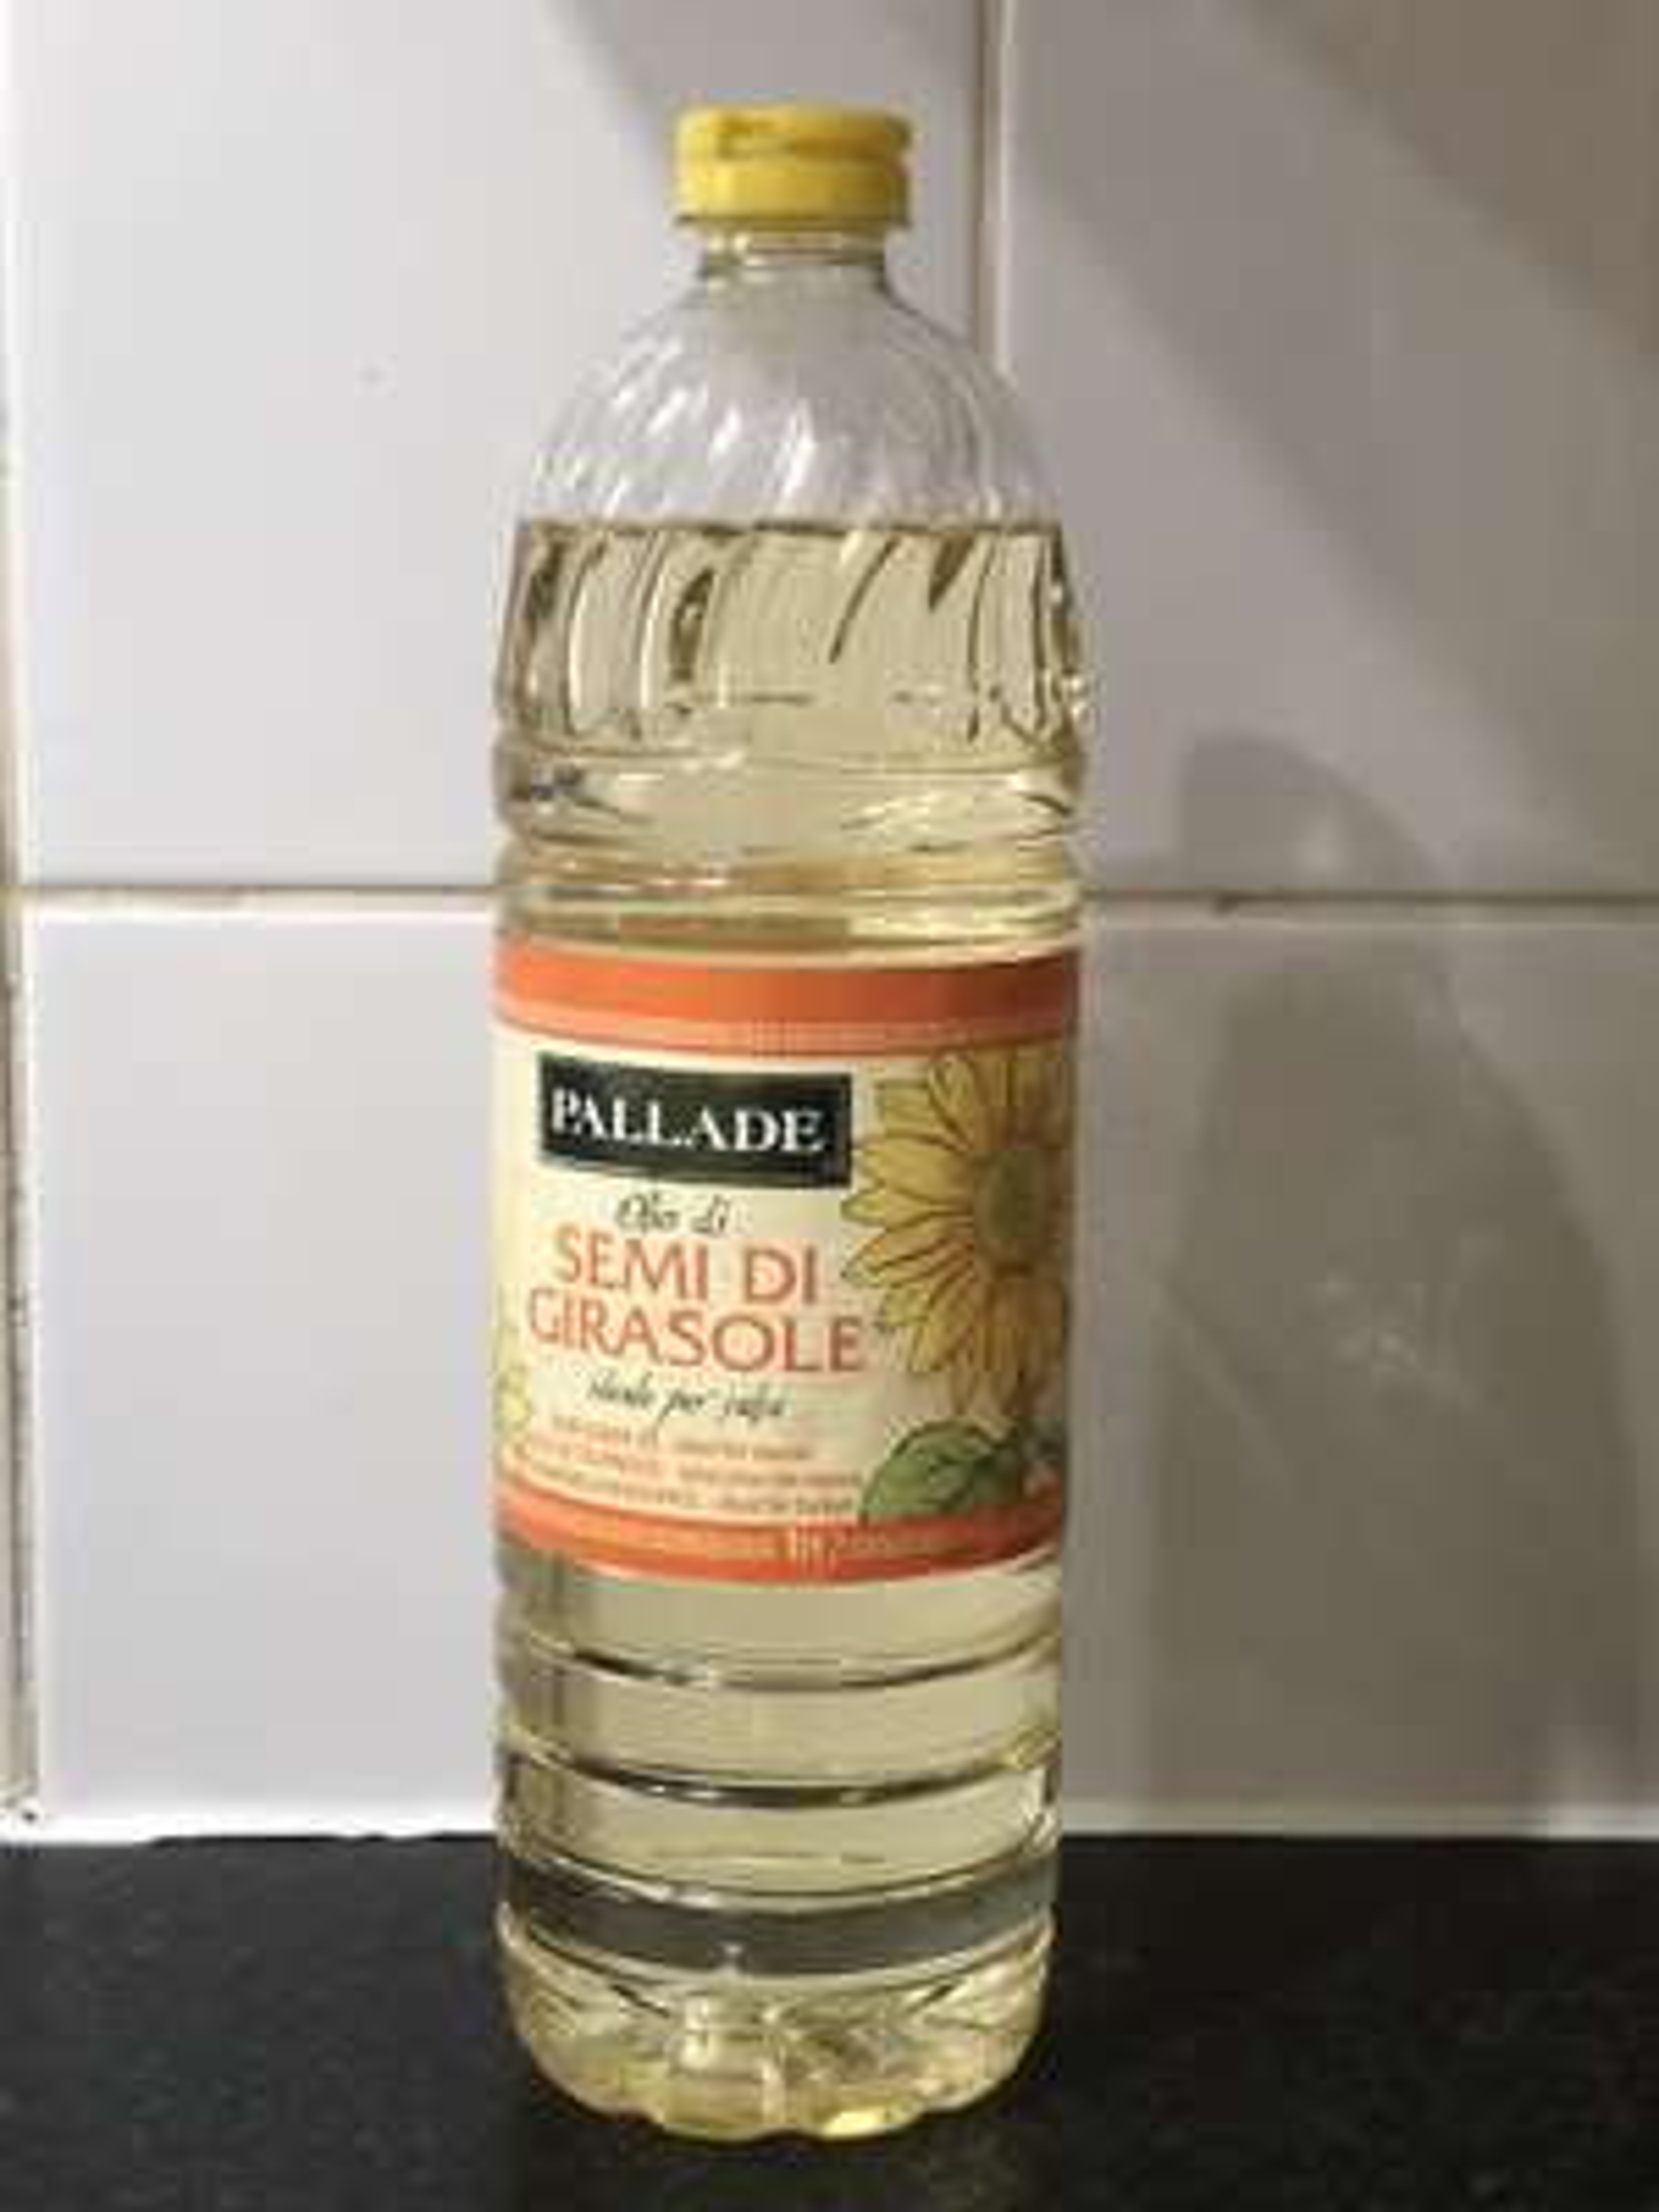 Pallade Sunflower Oil 1 Litre reduced to clear for 1p at Tesco (Shettleston)